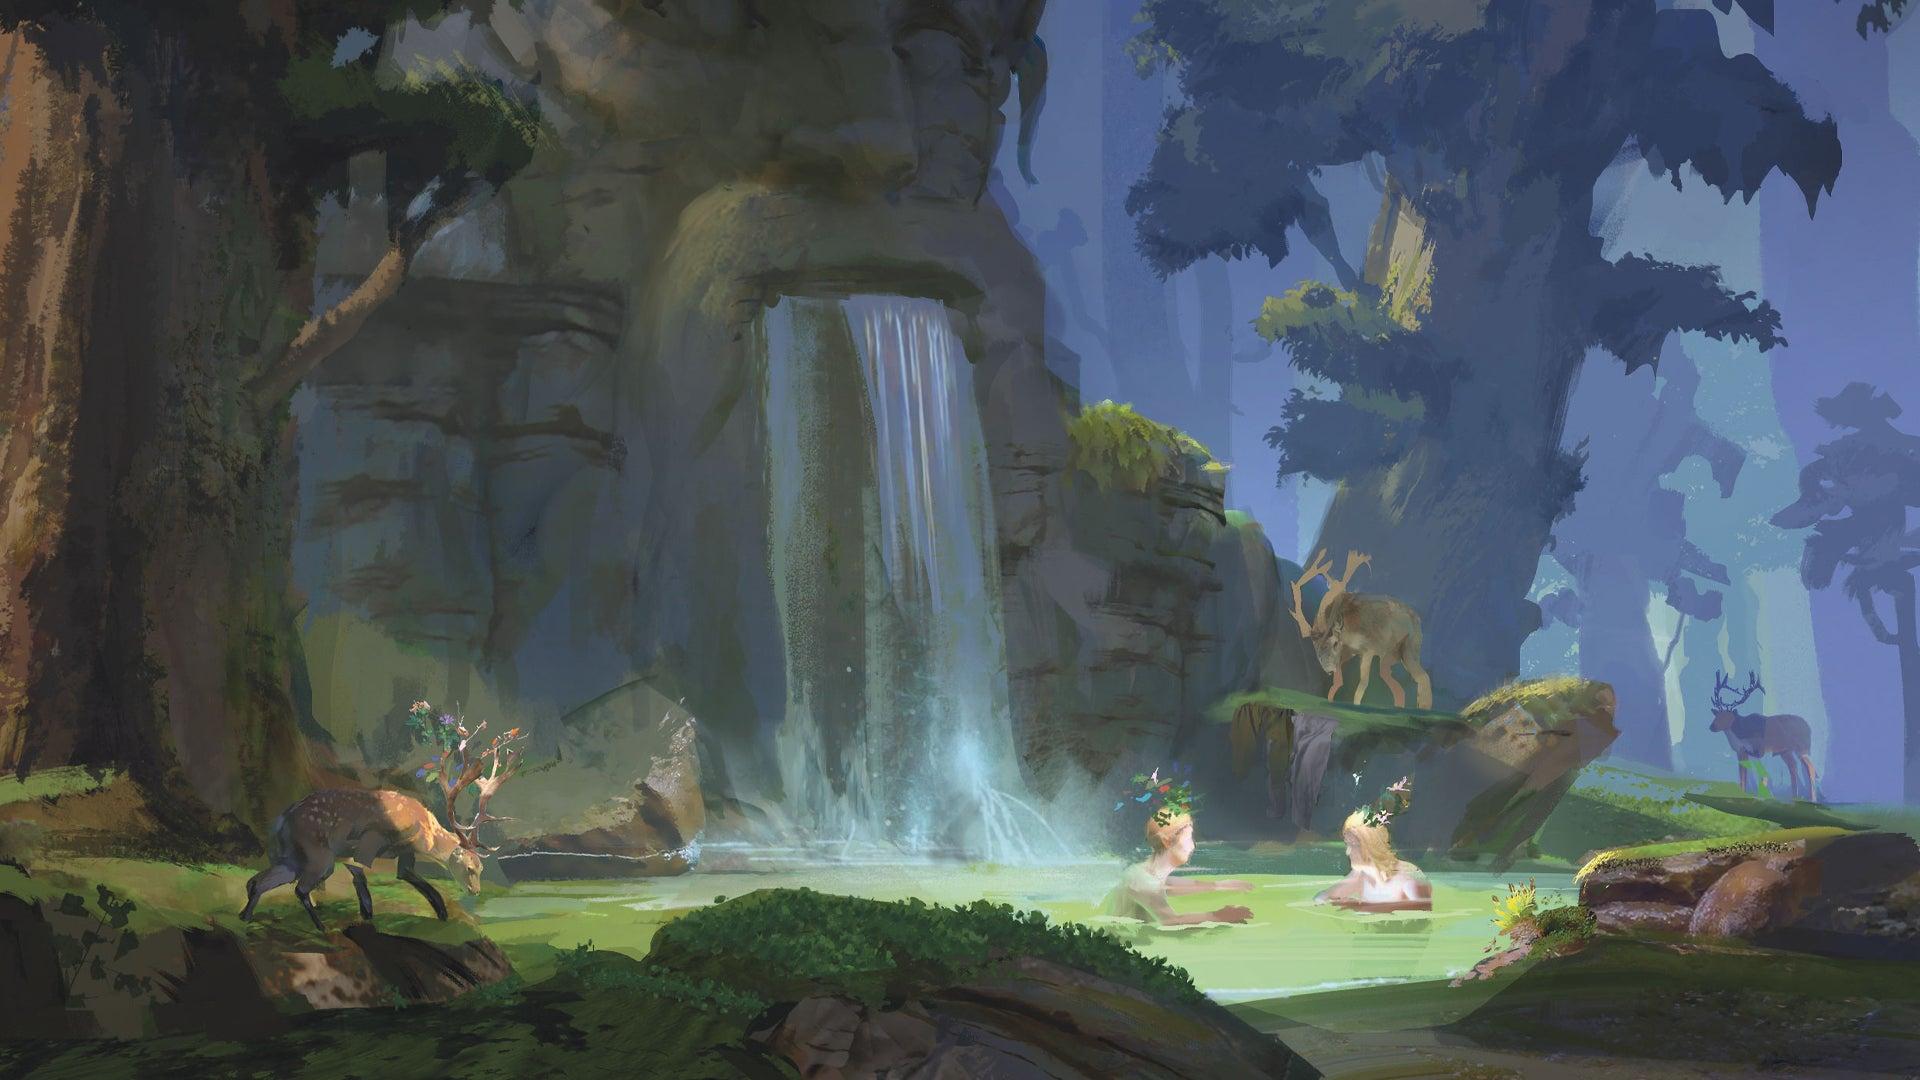 Tasha's Cauldron of Everything D&D RPG artwork 6